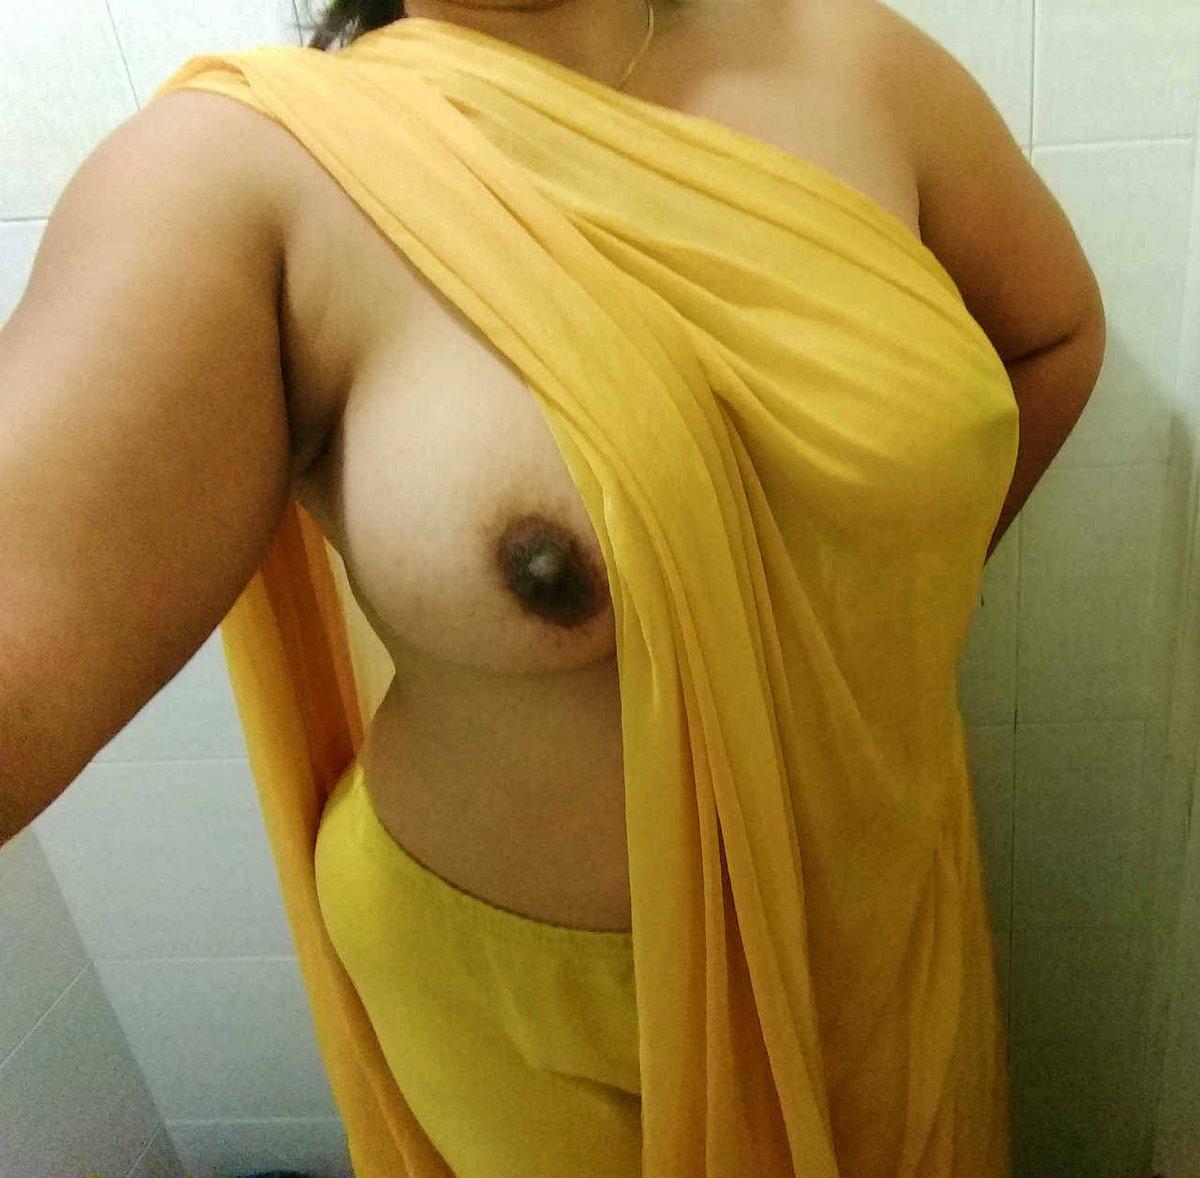 Desi Hairy Armpit Aunty Indian Porn